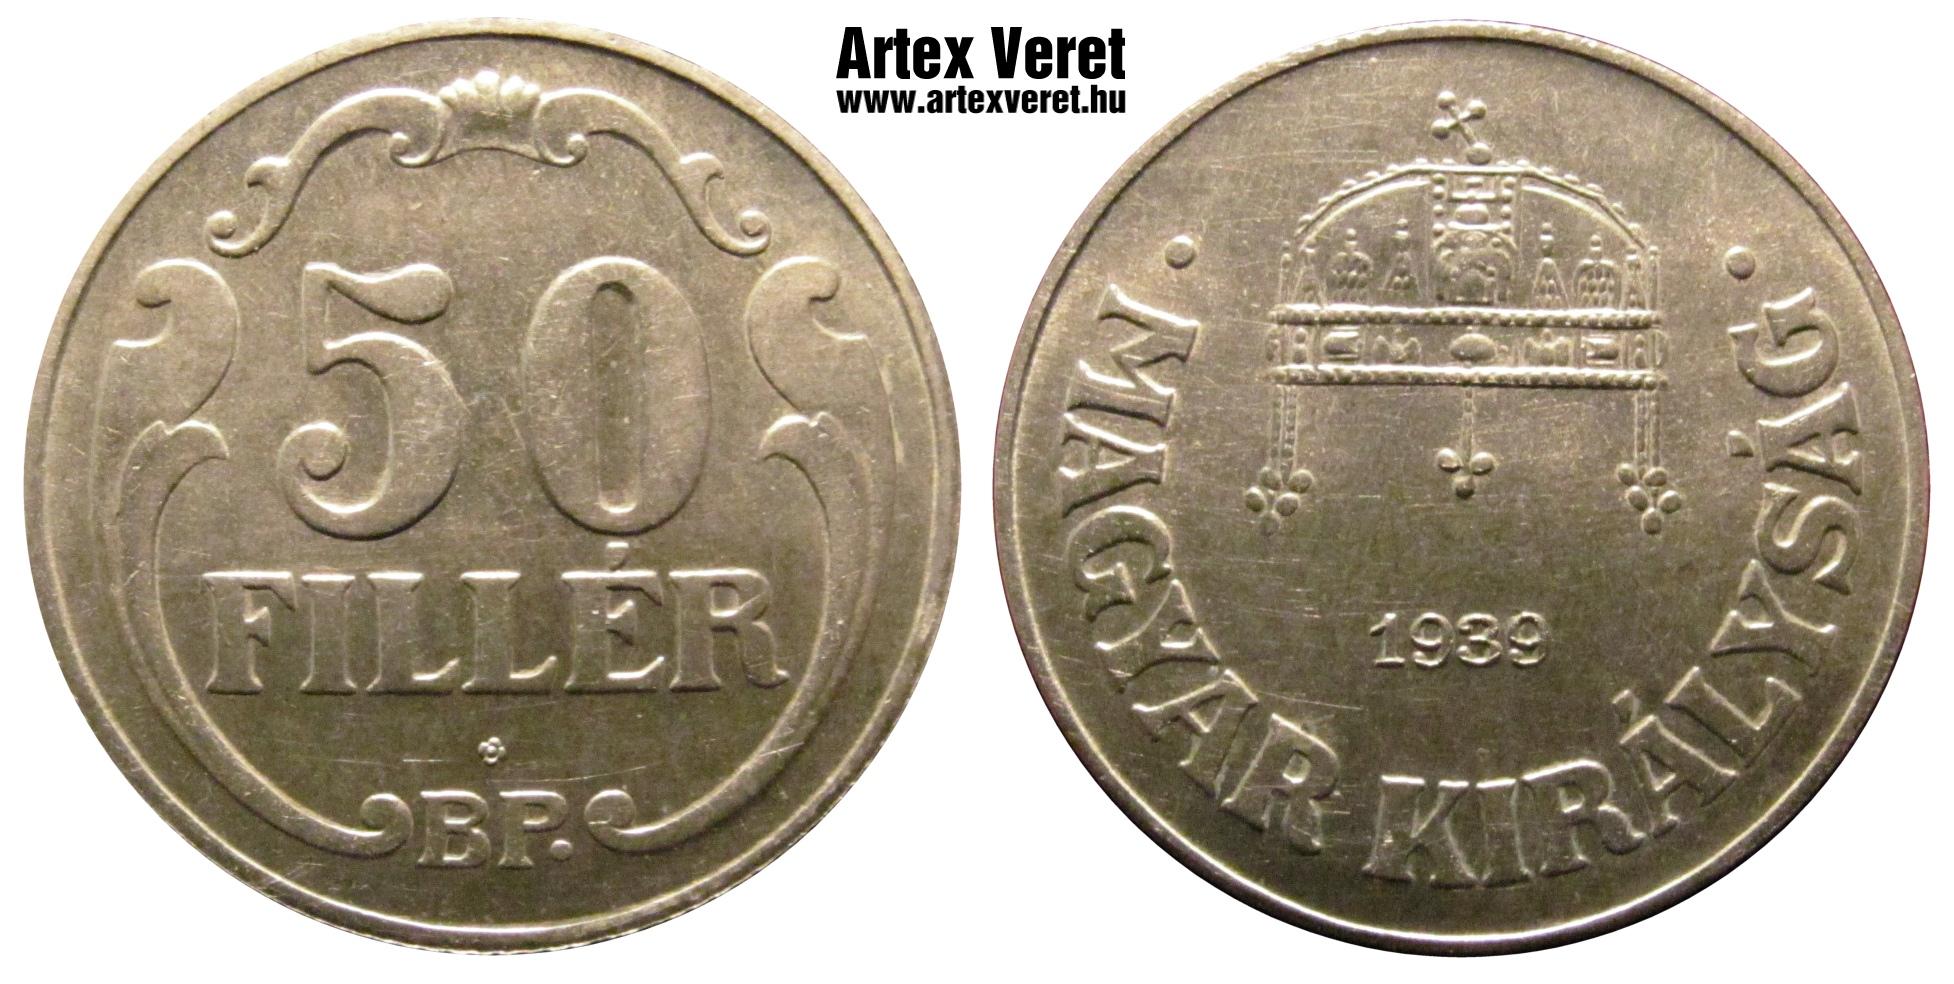 http://www.artexveret.hu/pengo-artex-utanveret/www_artexveret_hu_nikkel_1939_rozettas_artex_utanveret_50_filler.jpg